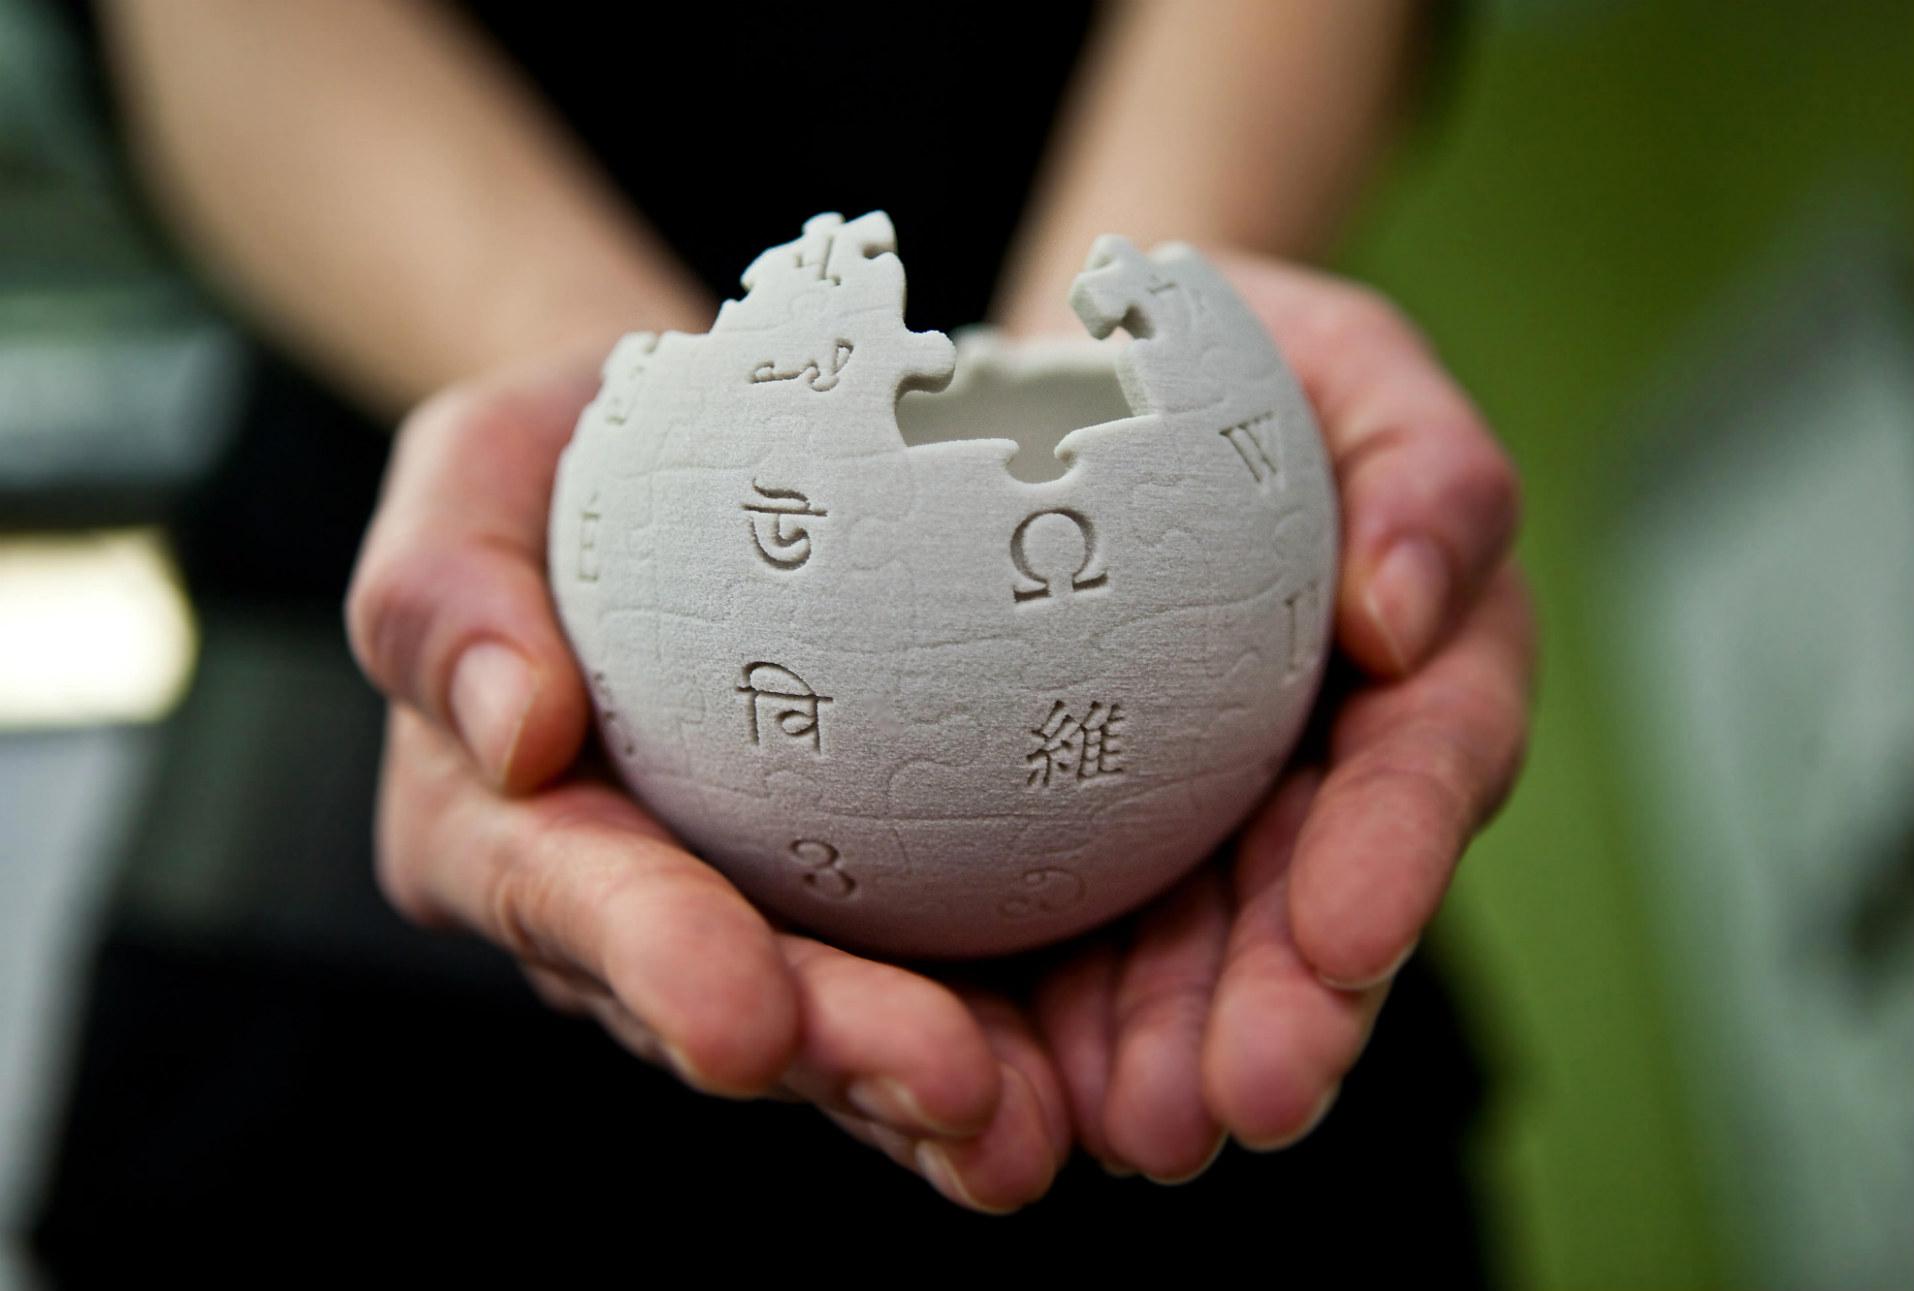 El protocolo HTTPS redujo la censura contra Wikipedia, revela estudio